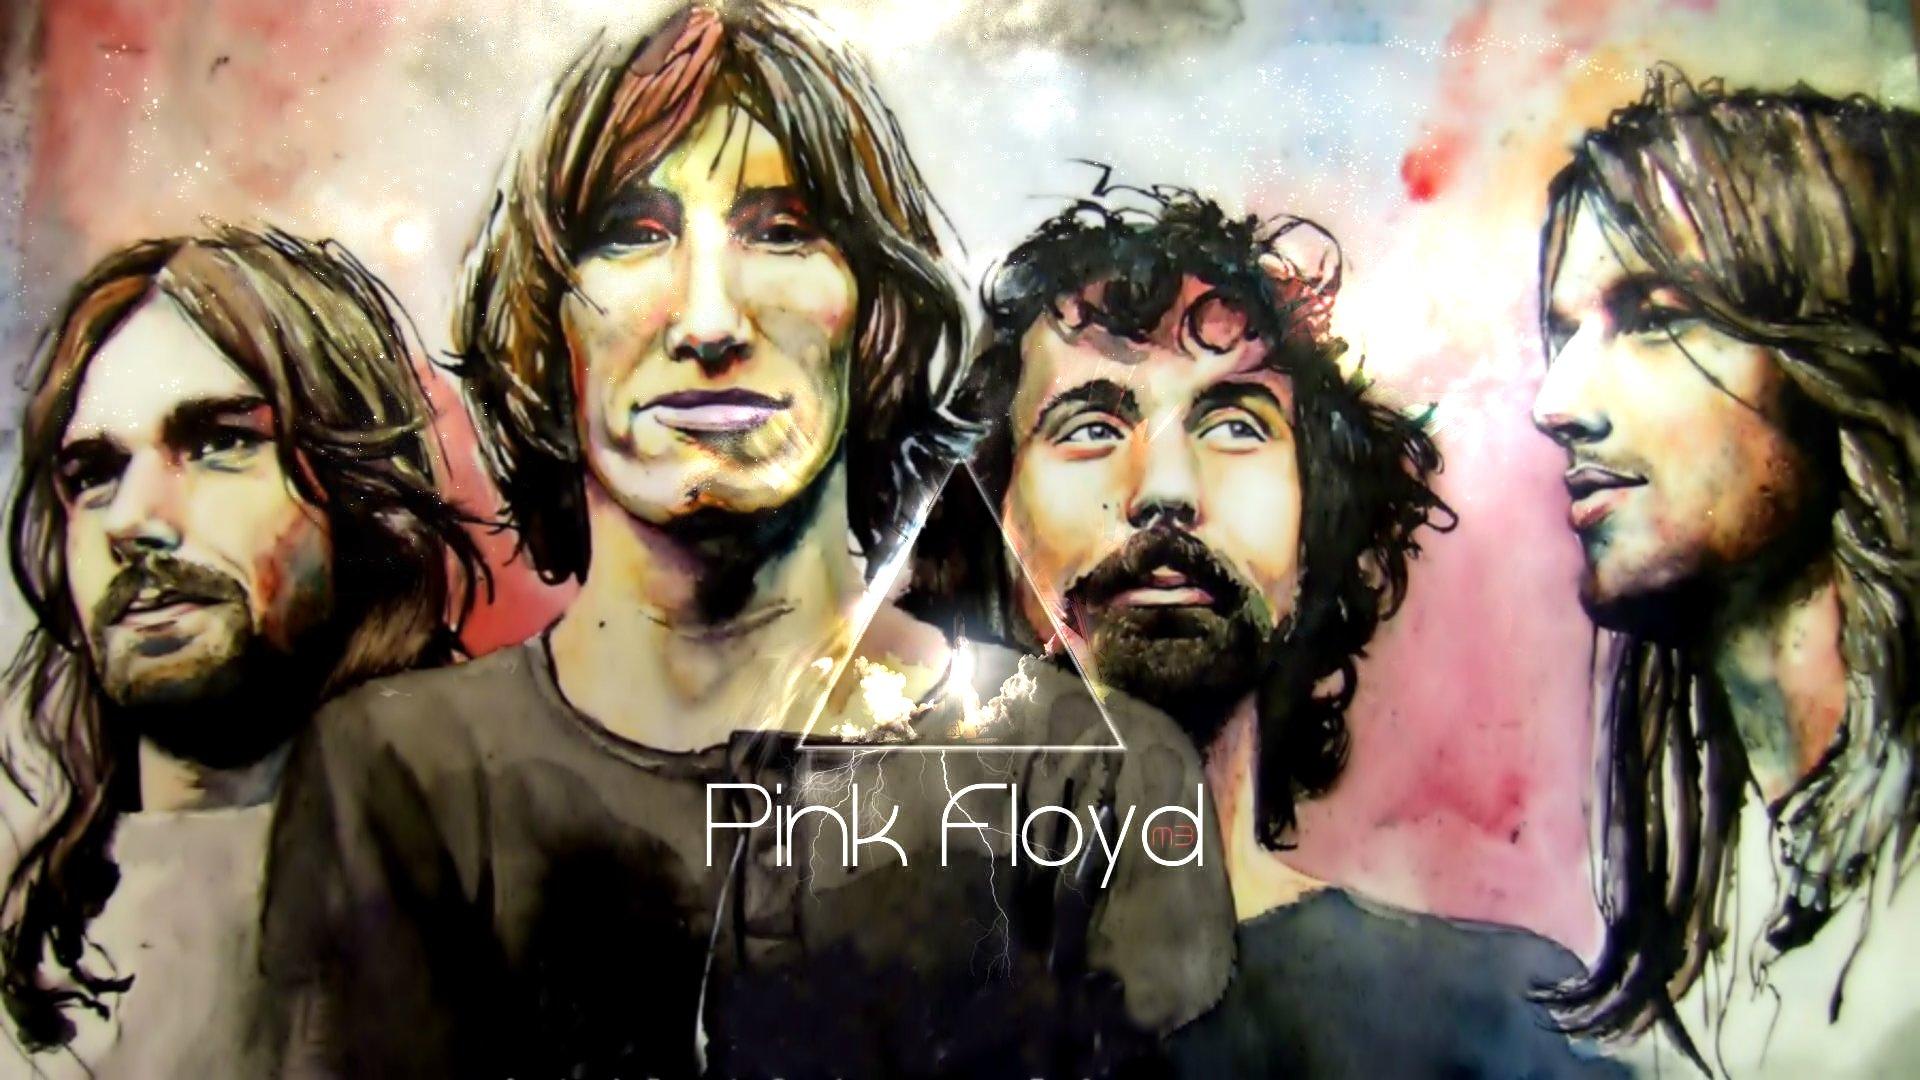 Pink Floyd Iphone X Wallpaper Pink Floyd Full Hd Fondo De Pantalla And Fondo De